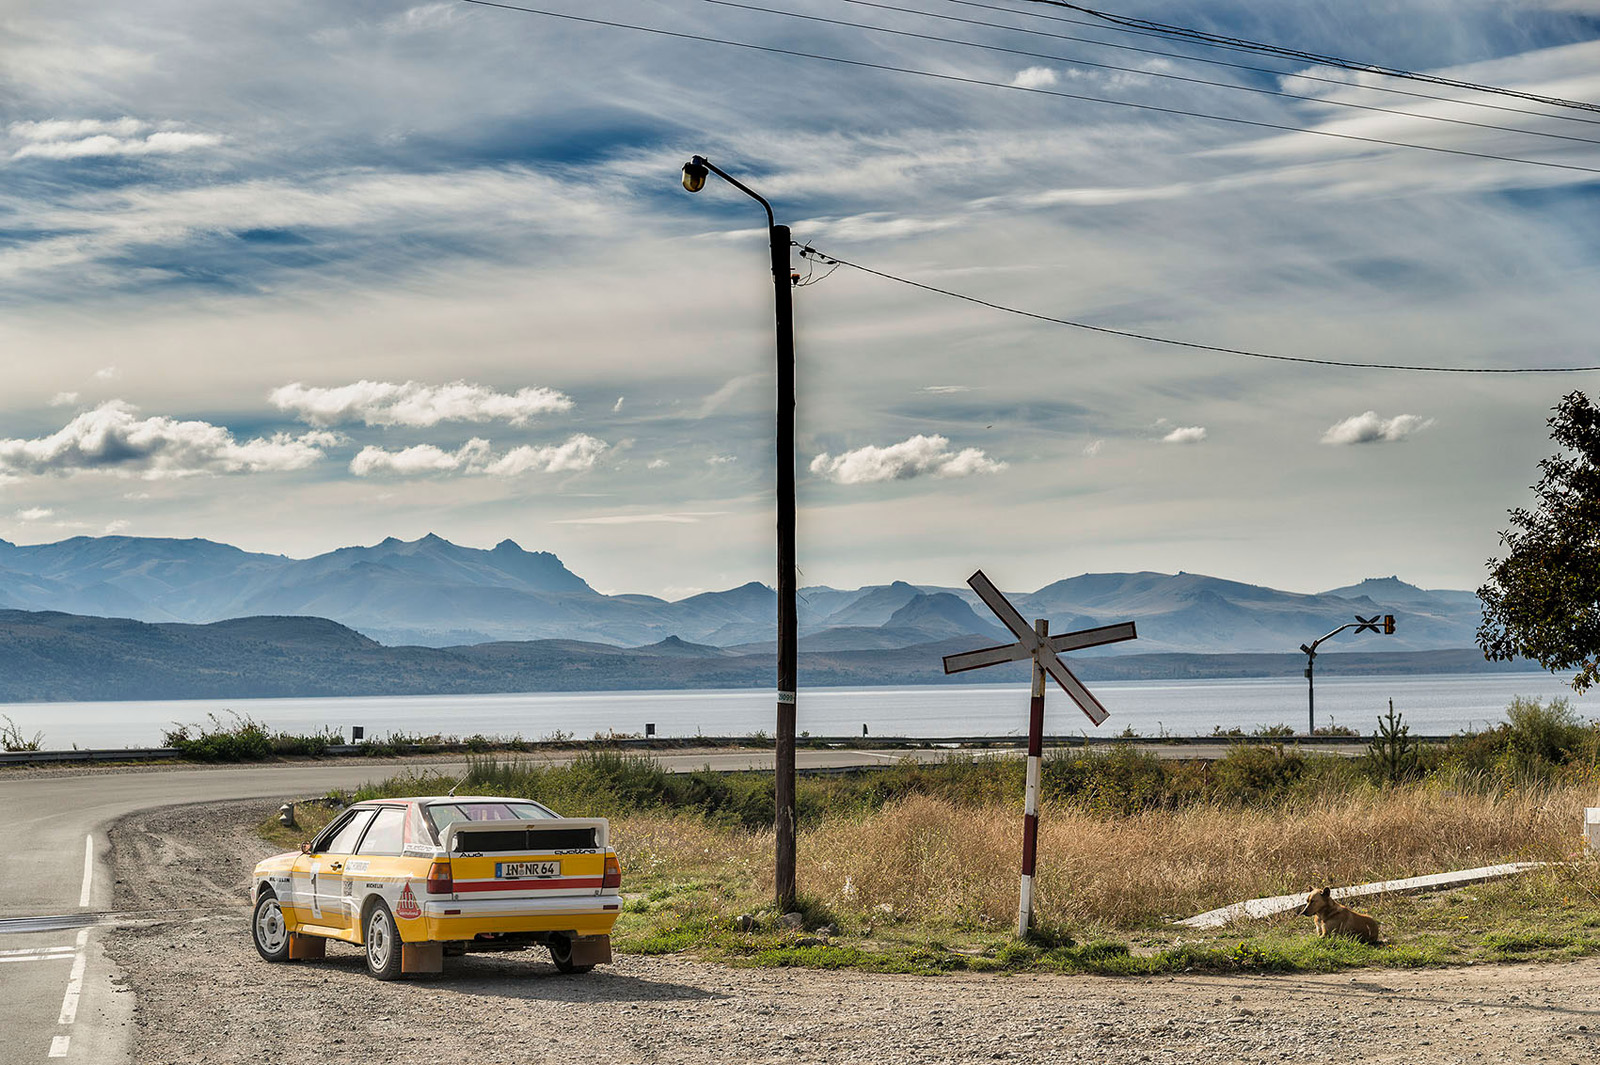 607_Audi_Rallyquattro_Arg_007.jpg